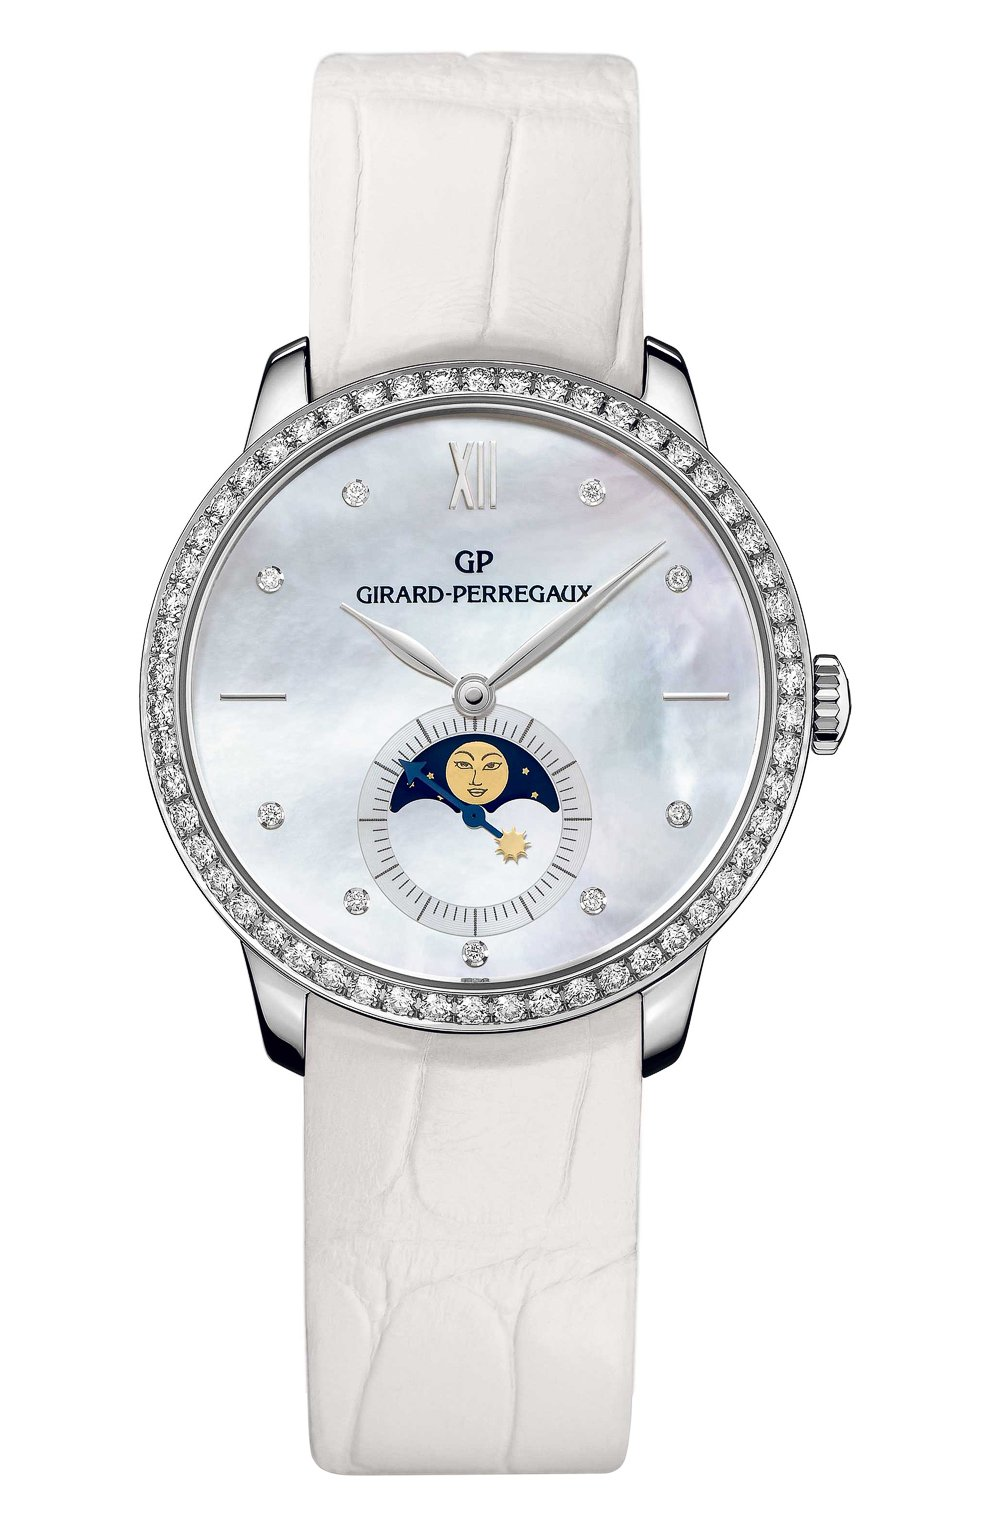 Женские часы white gold moon phase pearl GIRARD-PERREGAUX бесцветного цвета, арт. 49524D53A752-CK7A | Фото 1 (Механизм: Автомат; Цвет циферблата: Перламутровый; Материал корпуса: Белое золото)